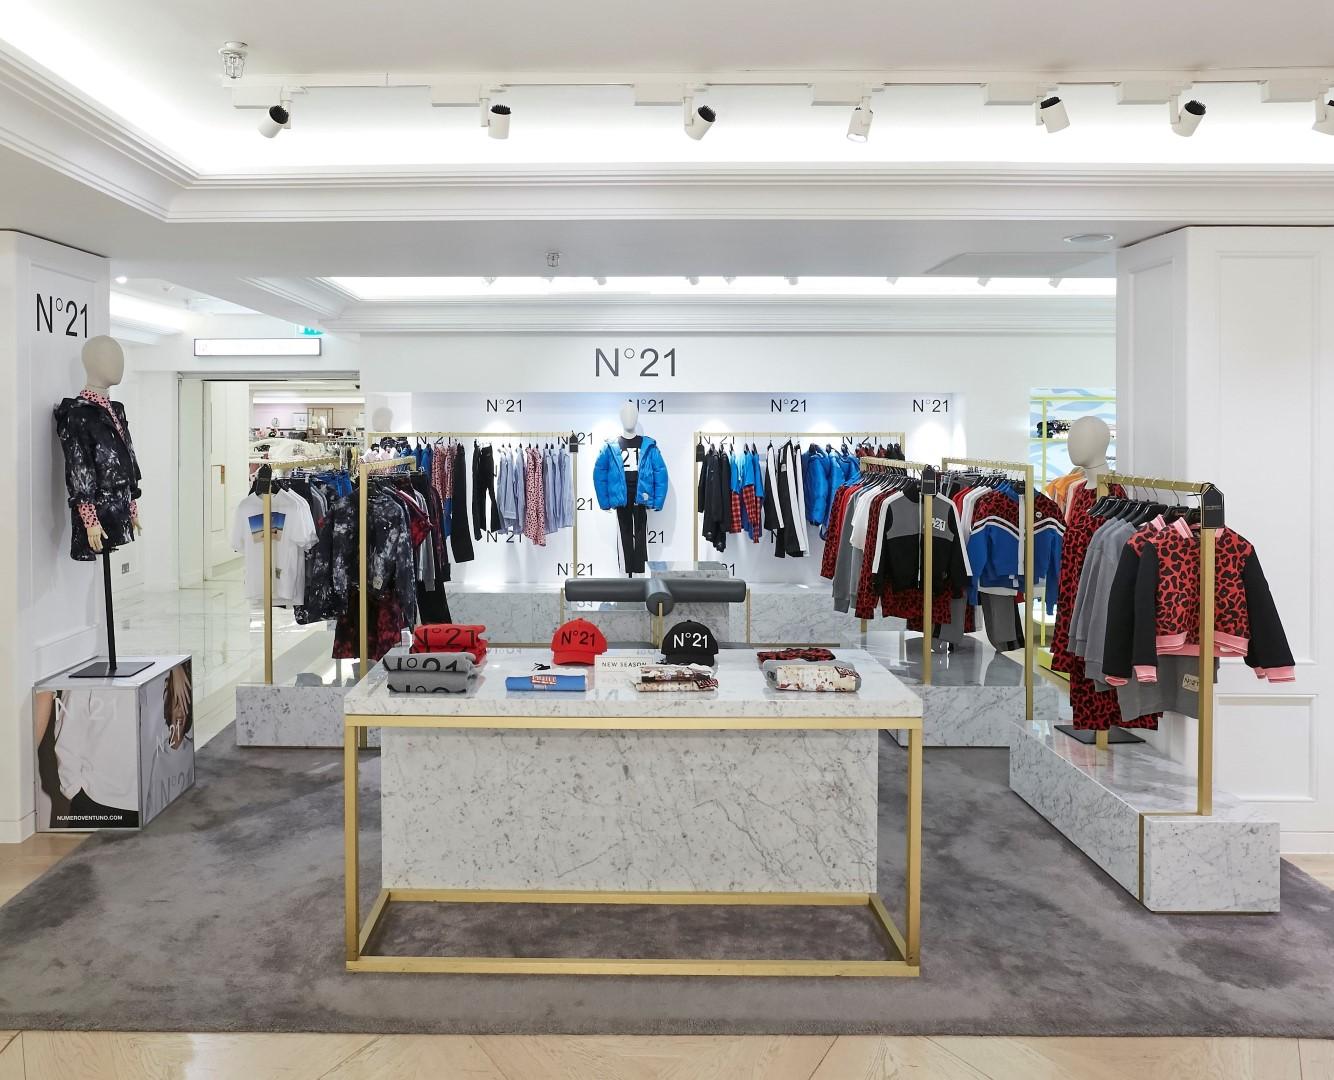 N21 Harrods pop-up store